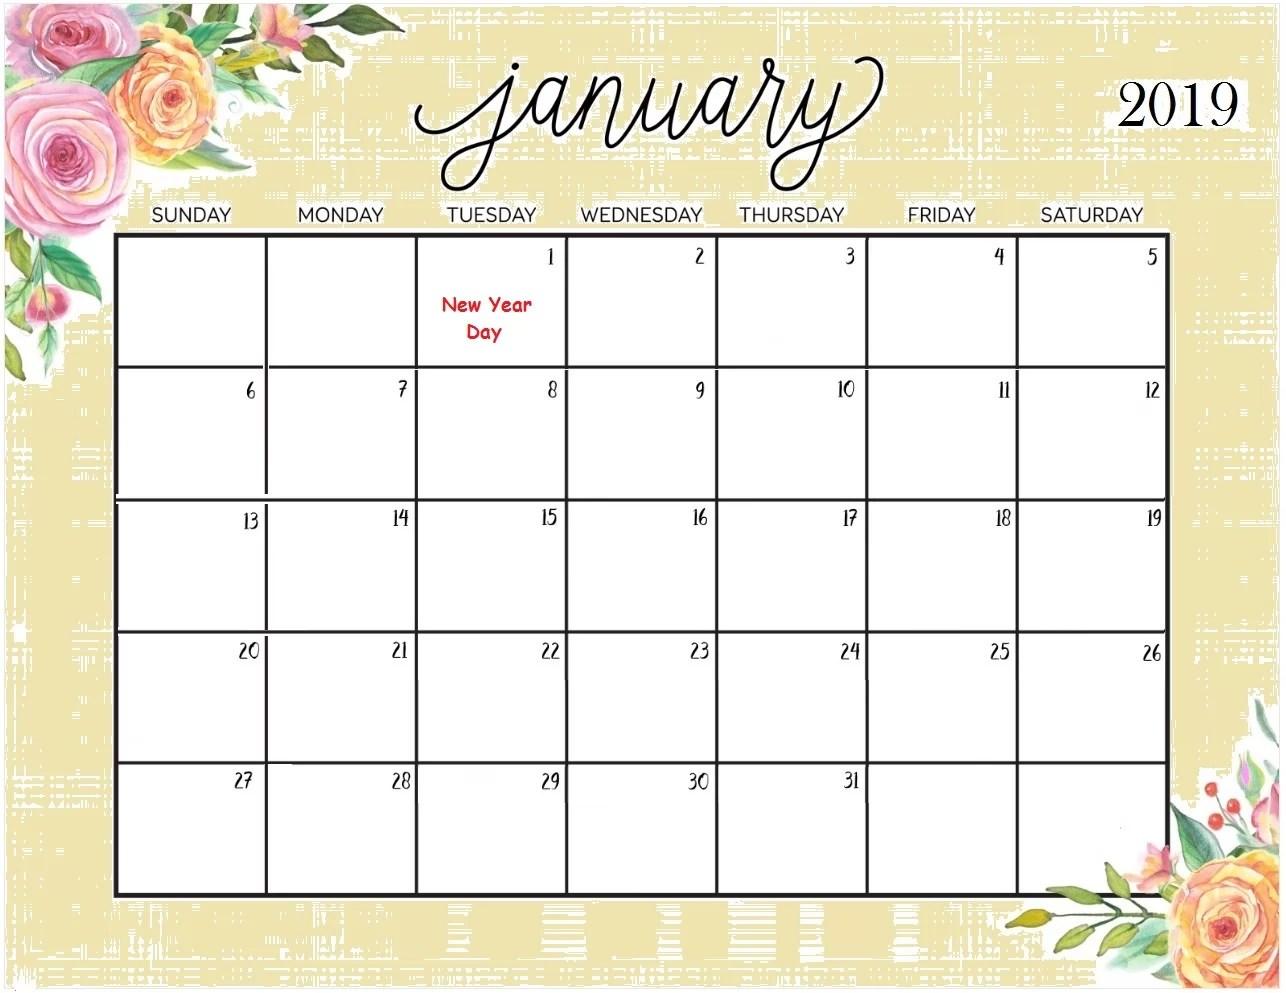 Calendar January 2019 Printable Template in PDF Word Excel